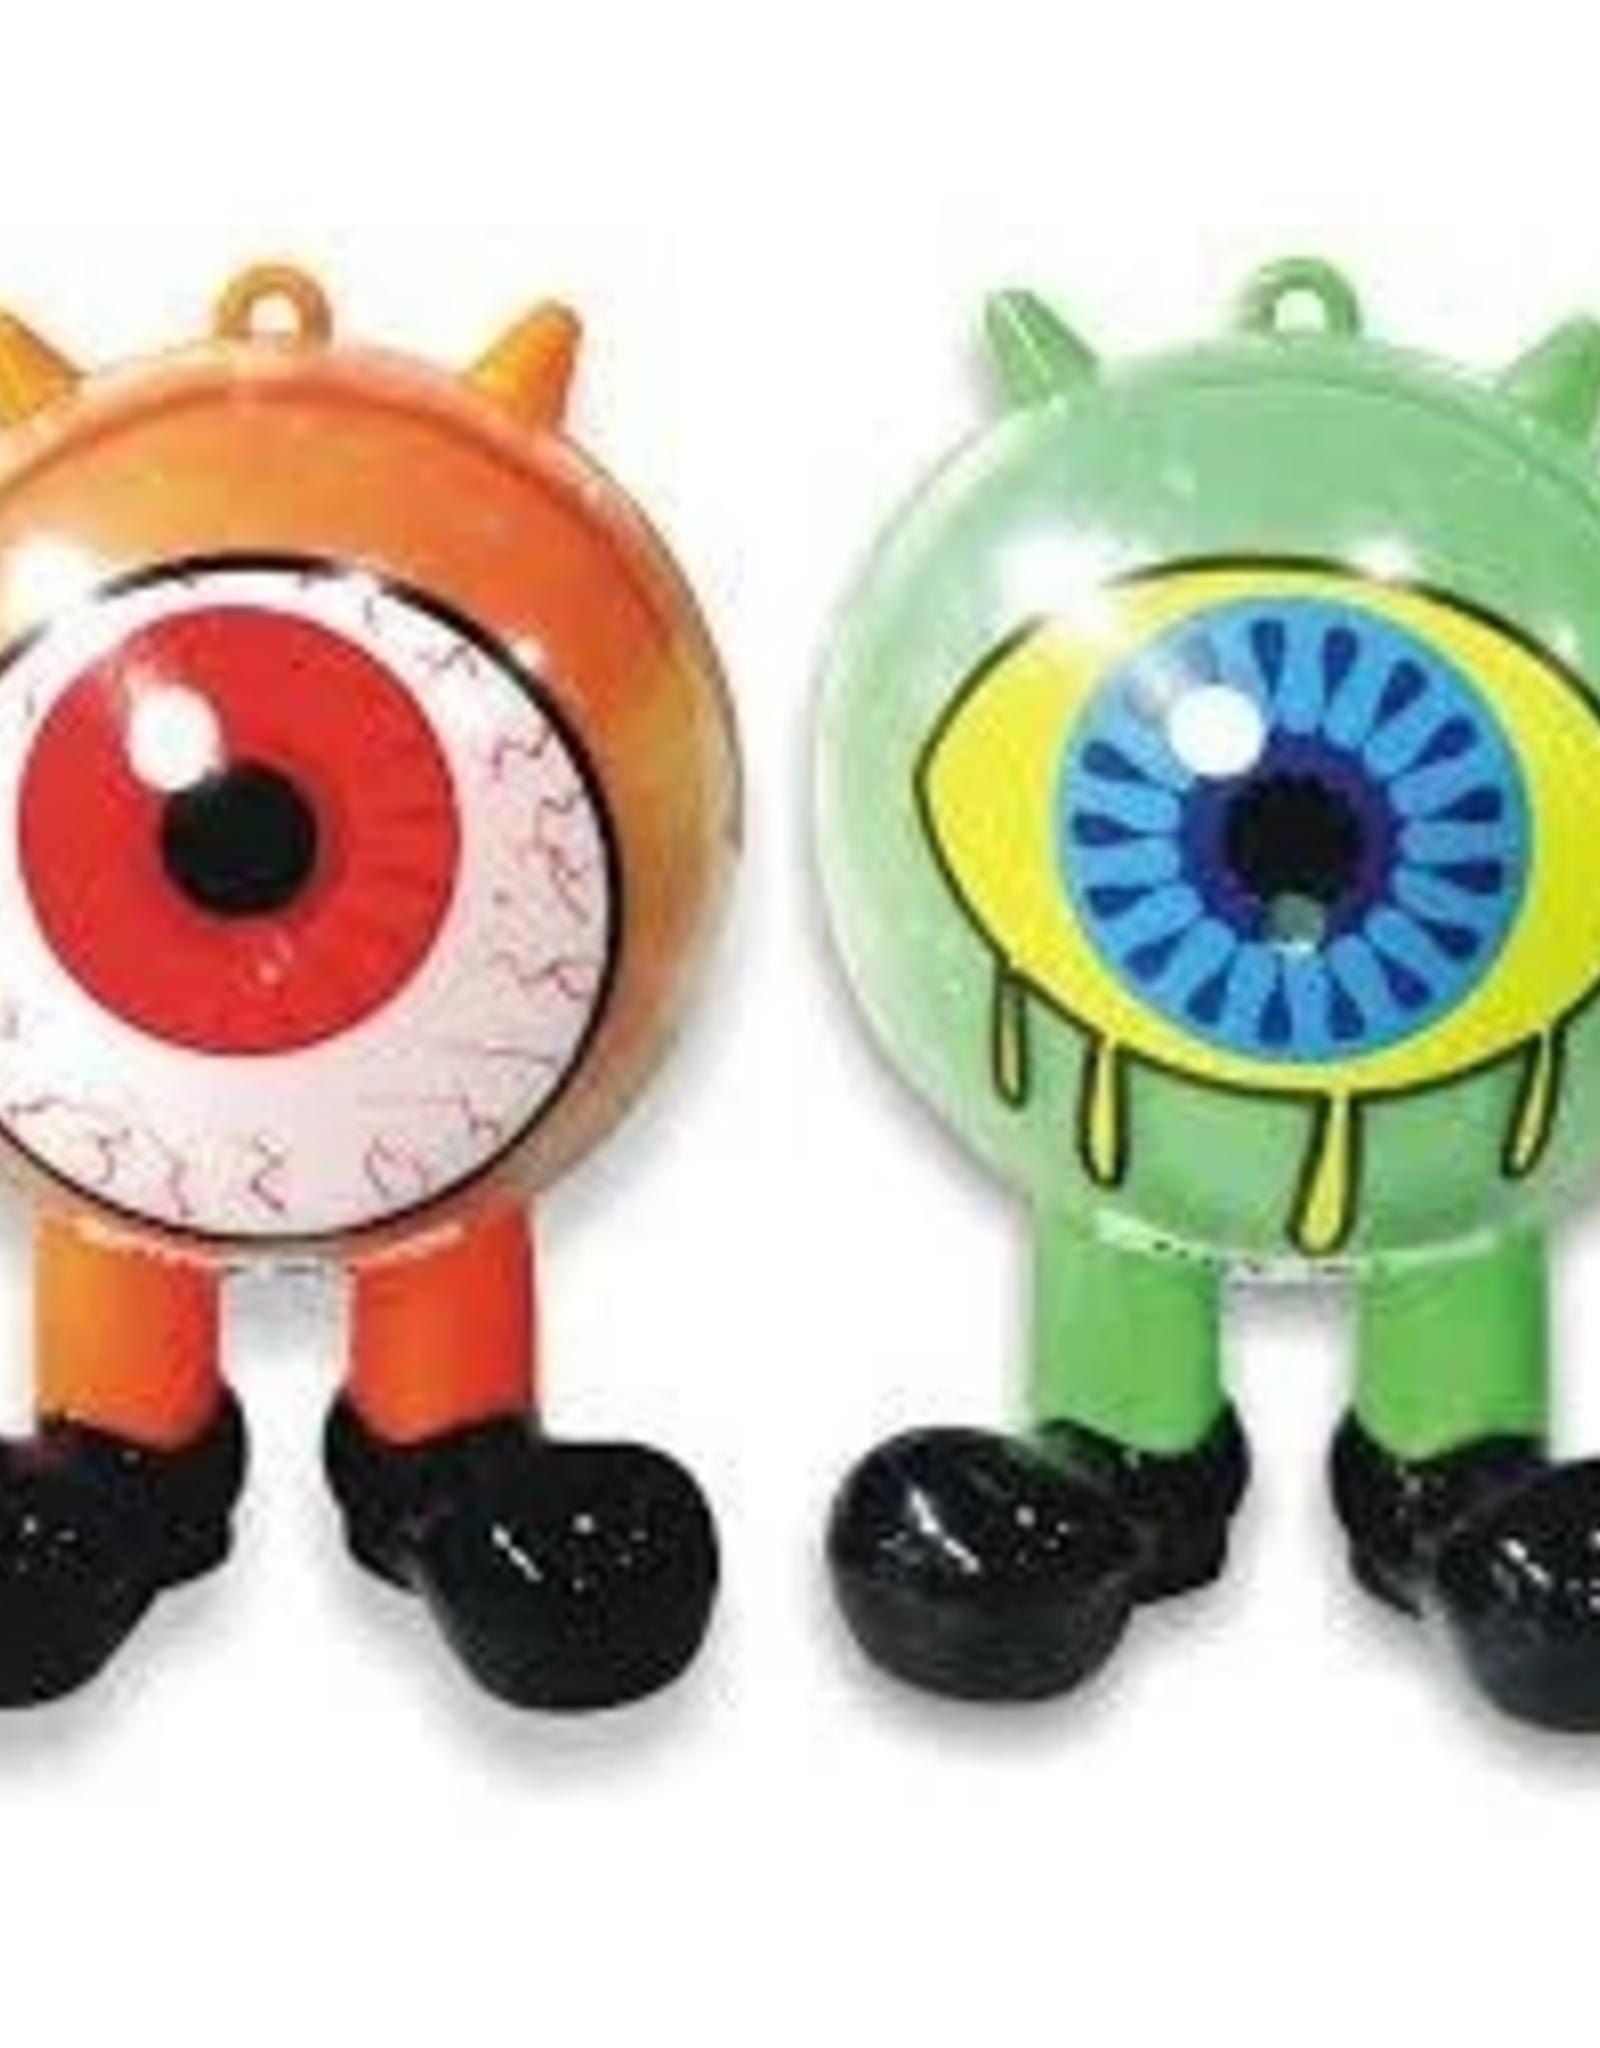 Kidsmania Kidsmania Icu Cyclops Monster 3.35oz